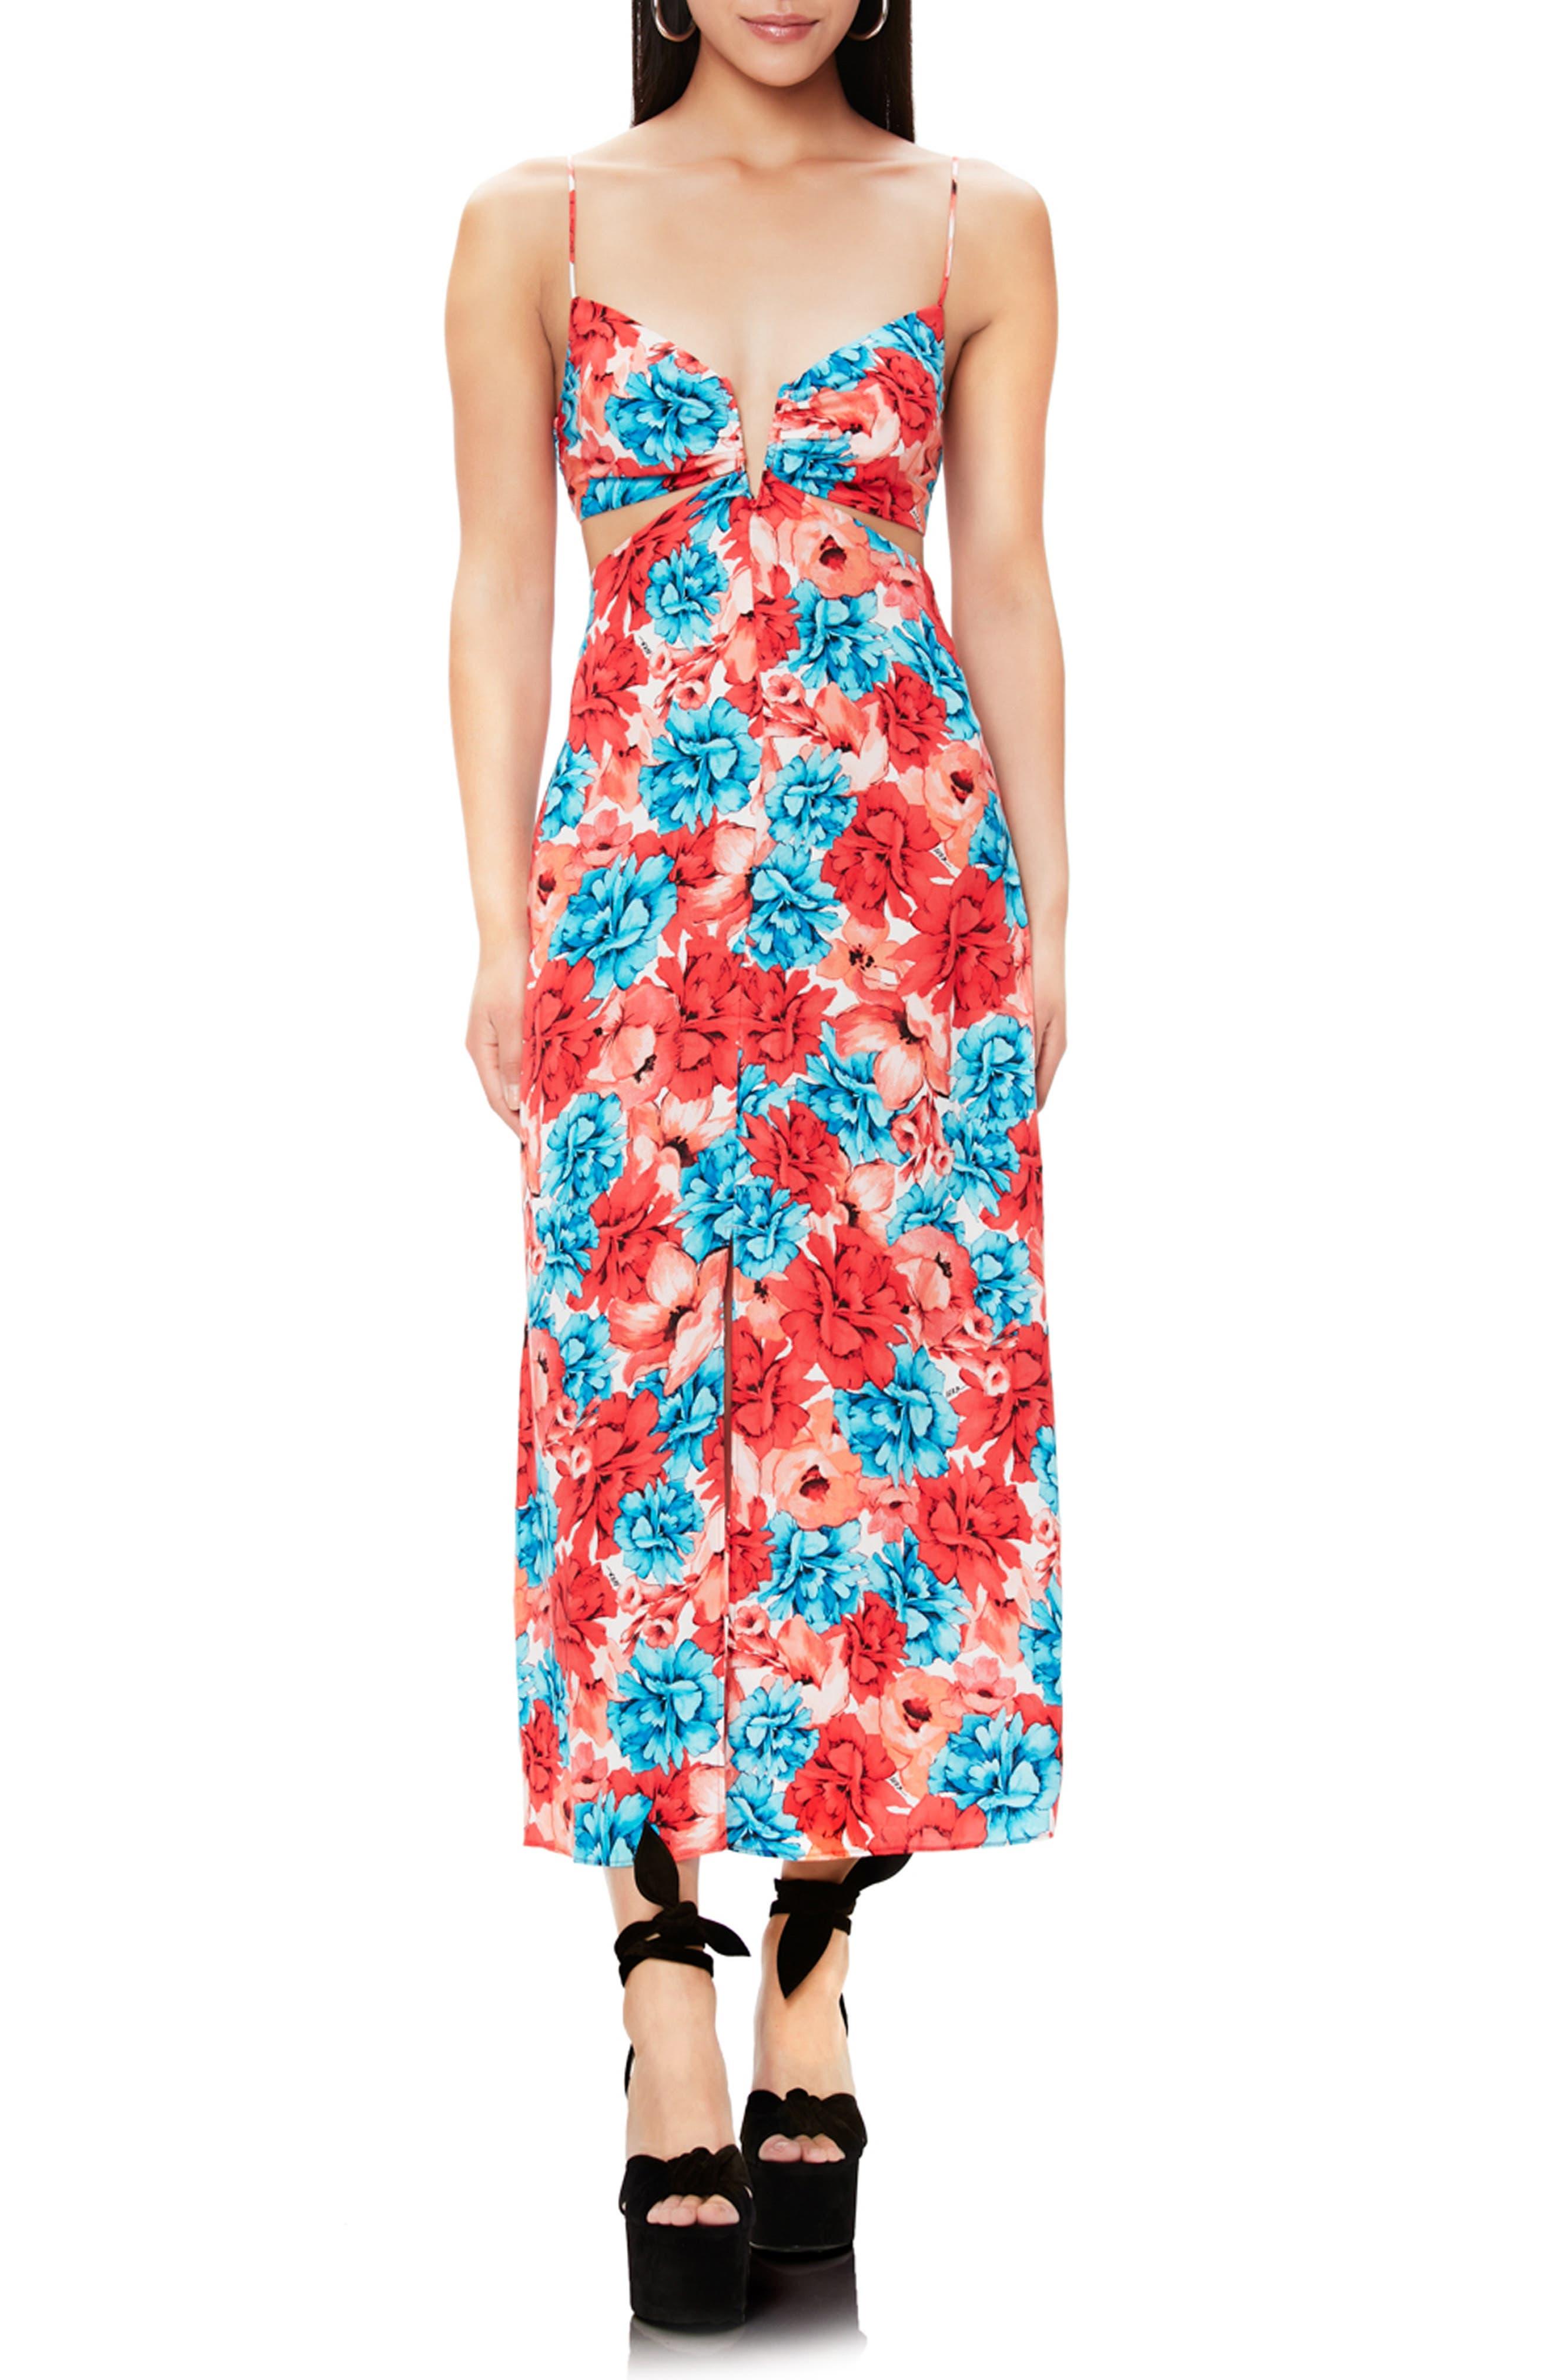 Afrm Koa Notch Neck Cutout Print Midi Dress, Red